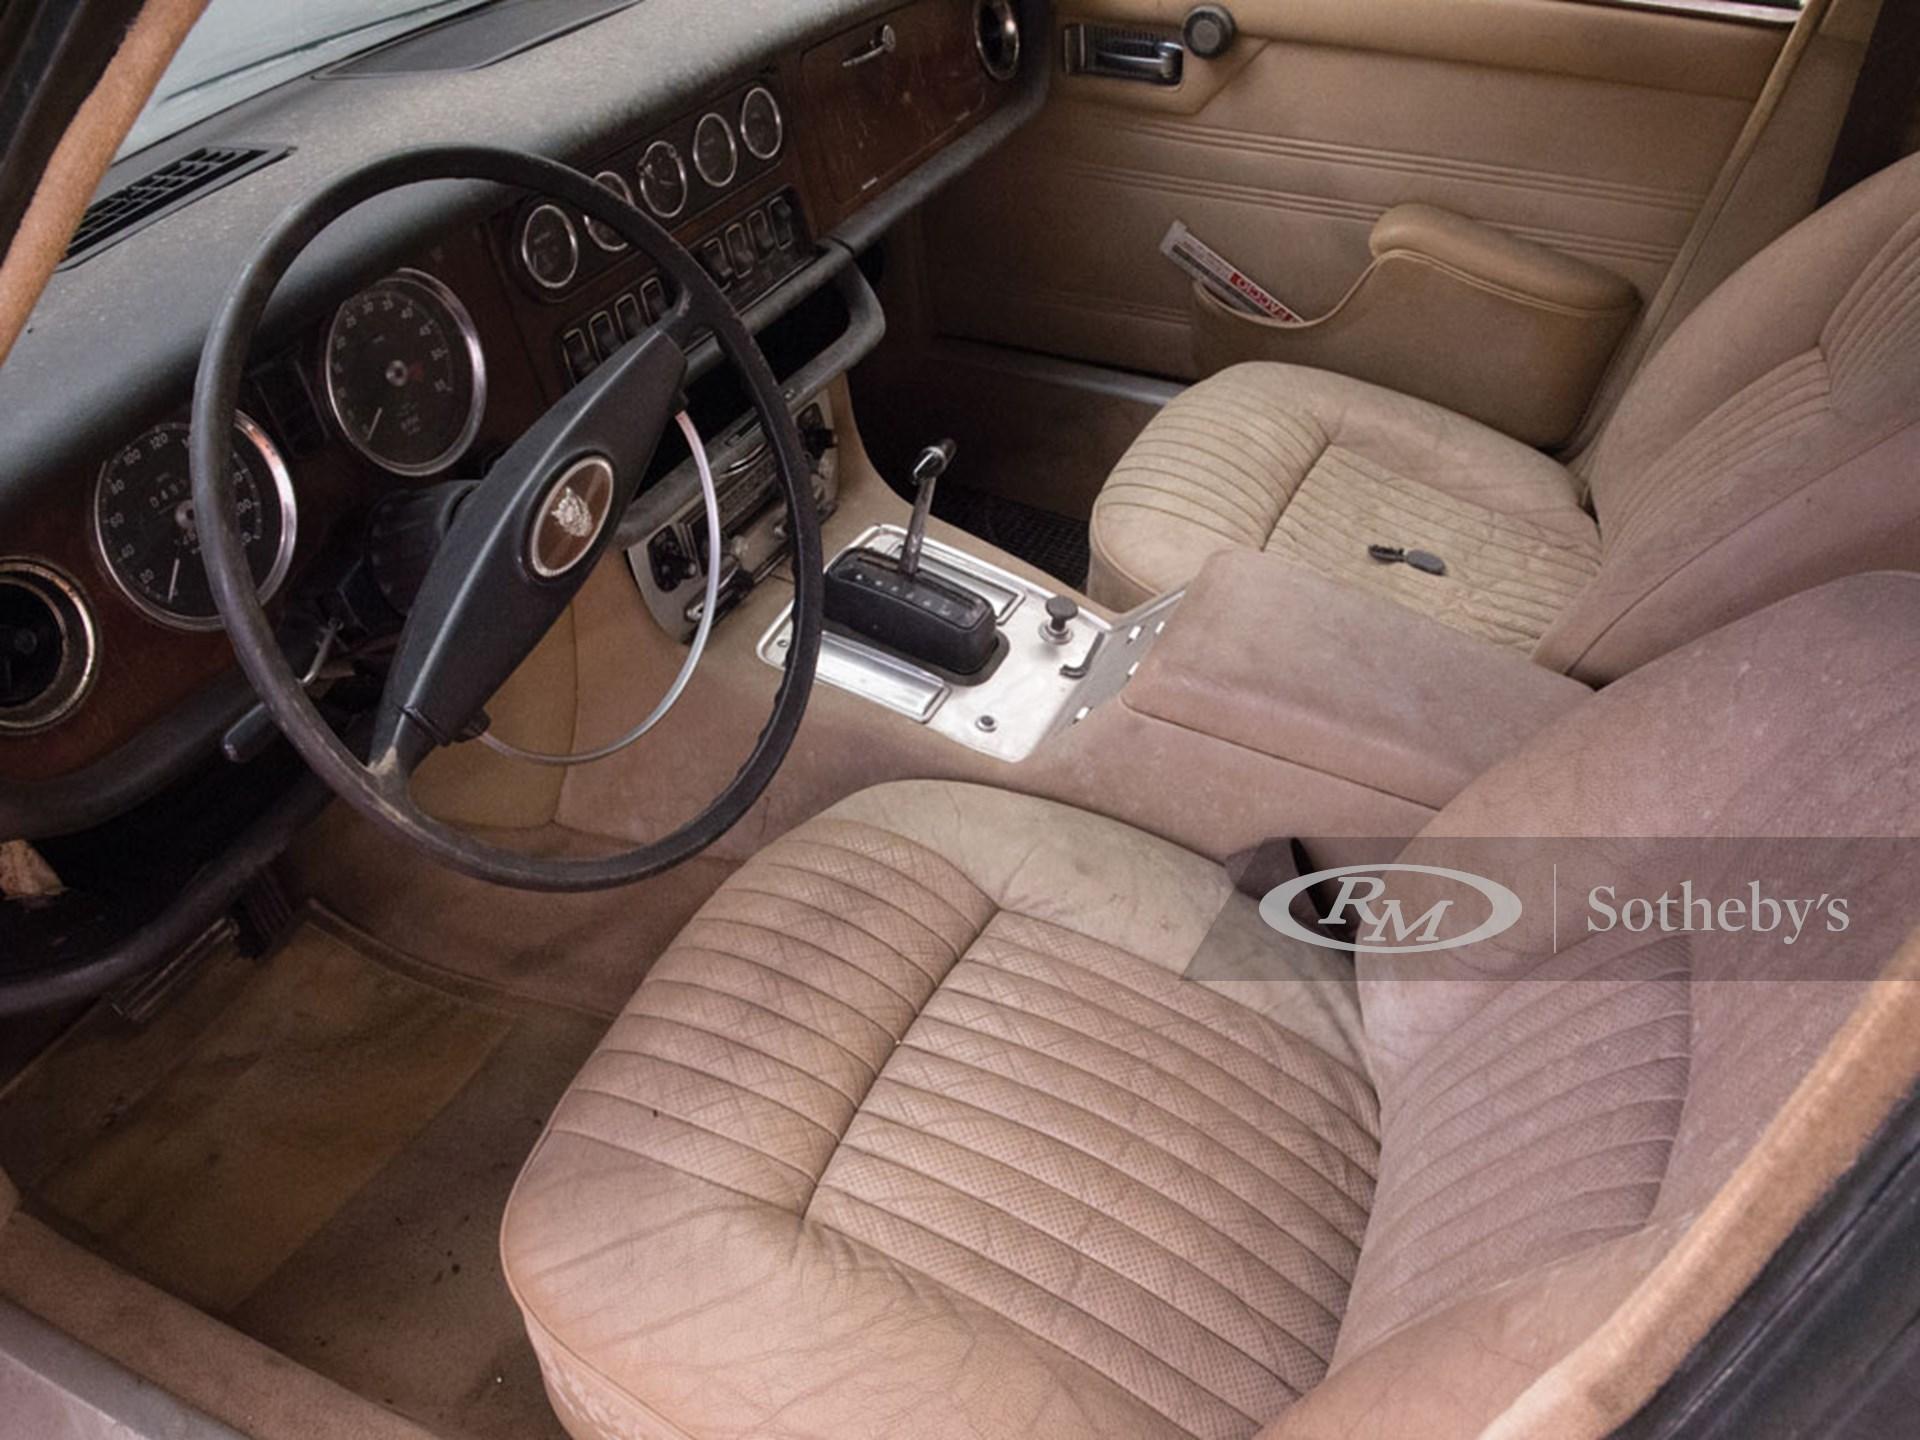 1969 Jaguar XJ6 4.2 SWB   Duemila Ruote 2016   RM Auctions